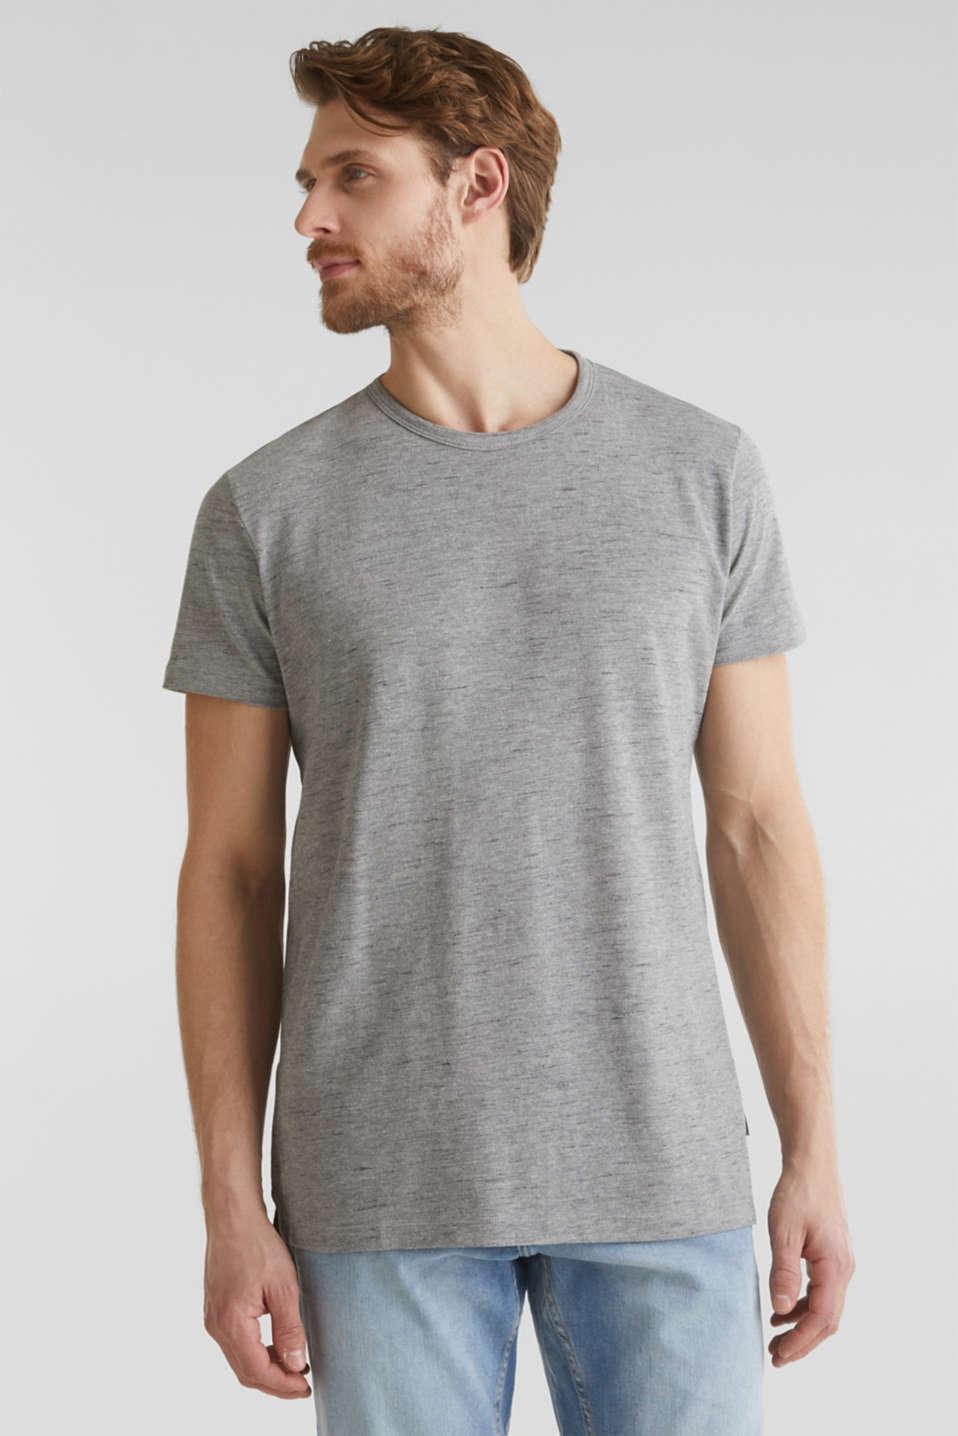 Melange piqué T-shirt, MEDIUM GREY 5, detail image number 0